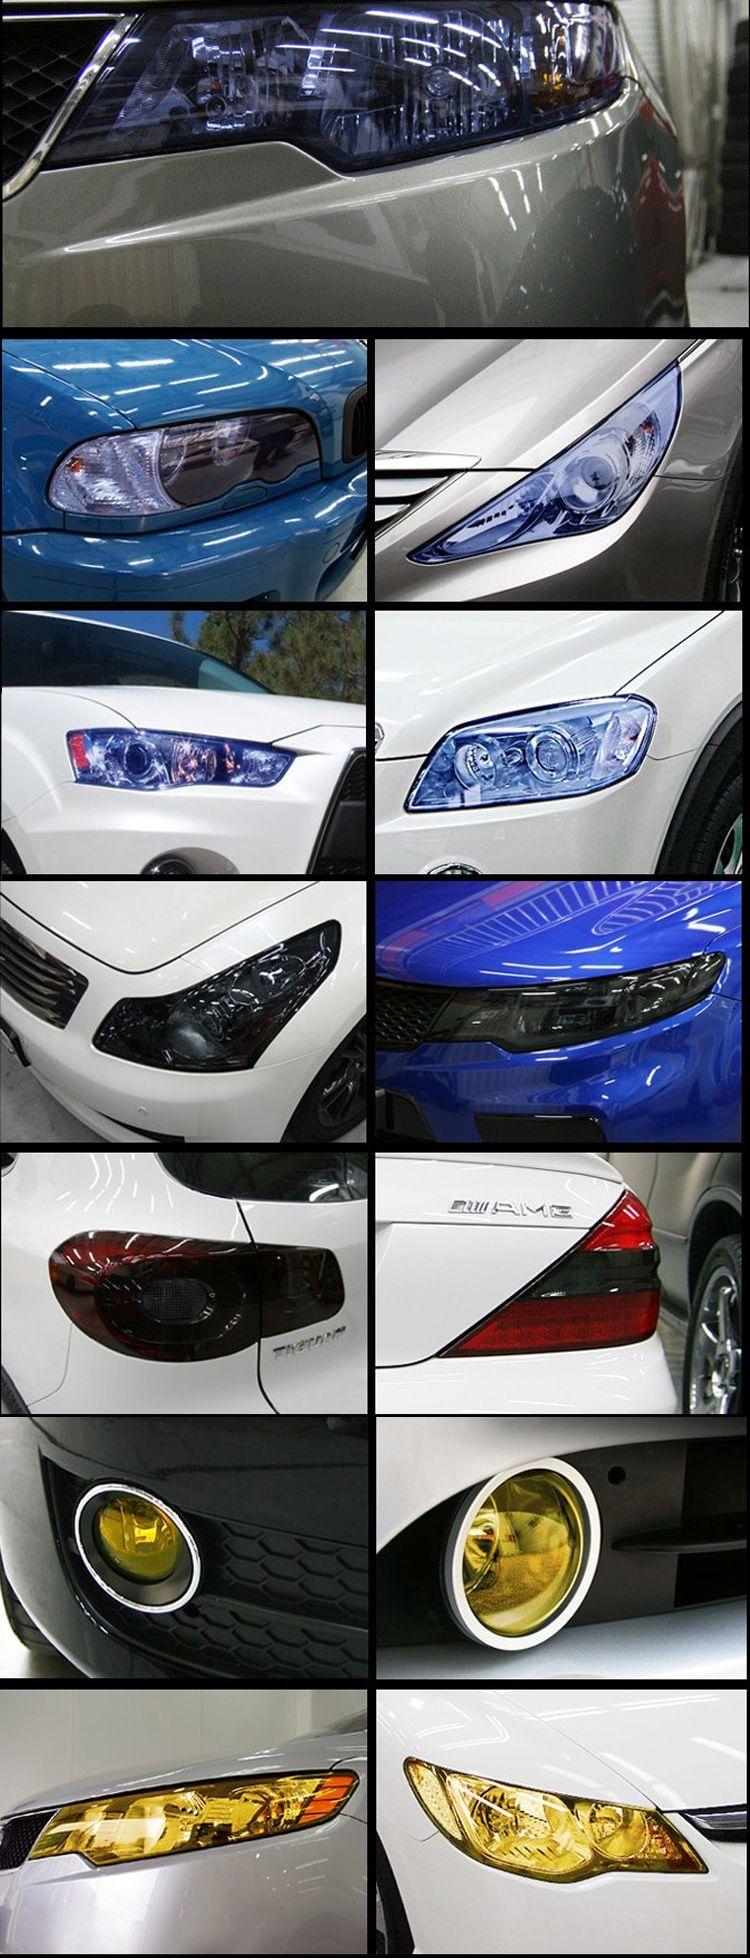 Car visor sticker designs - Best Vinyl Car Sticker Cheap Carbon Fiber Vinyl Film Tail Car Sun Visor Covers